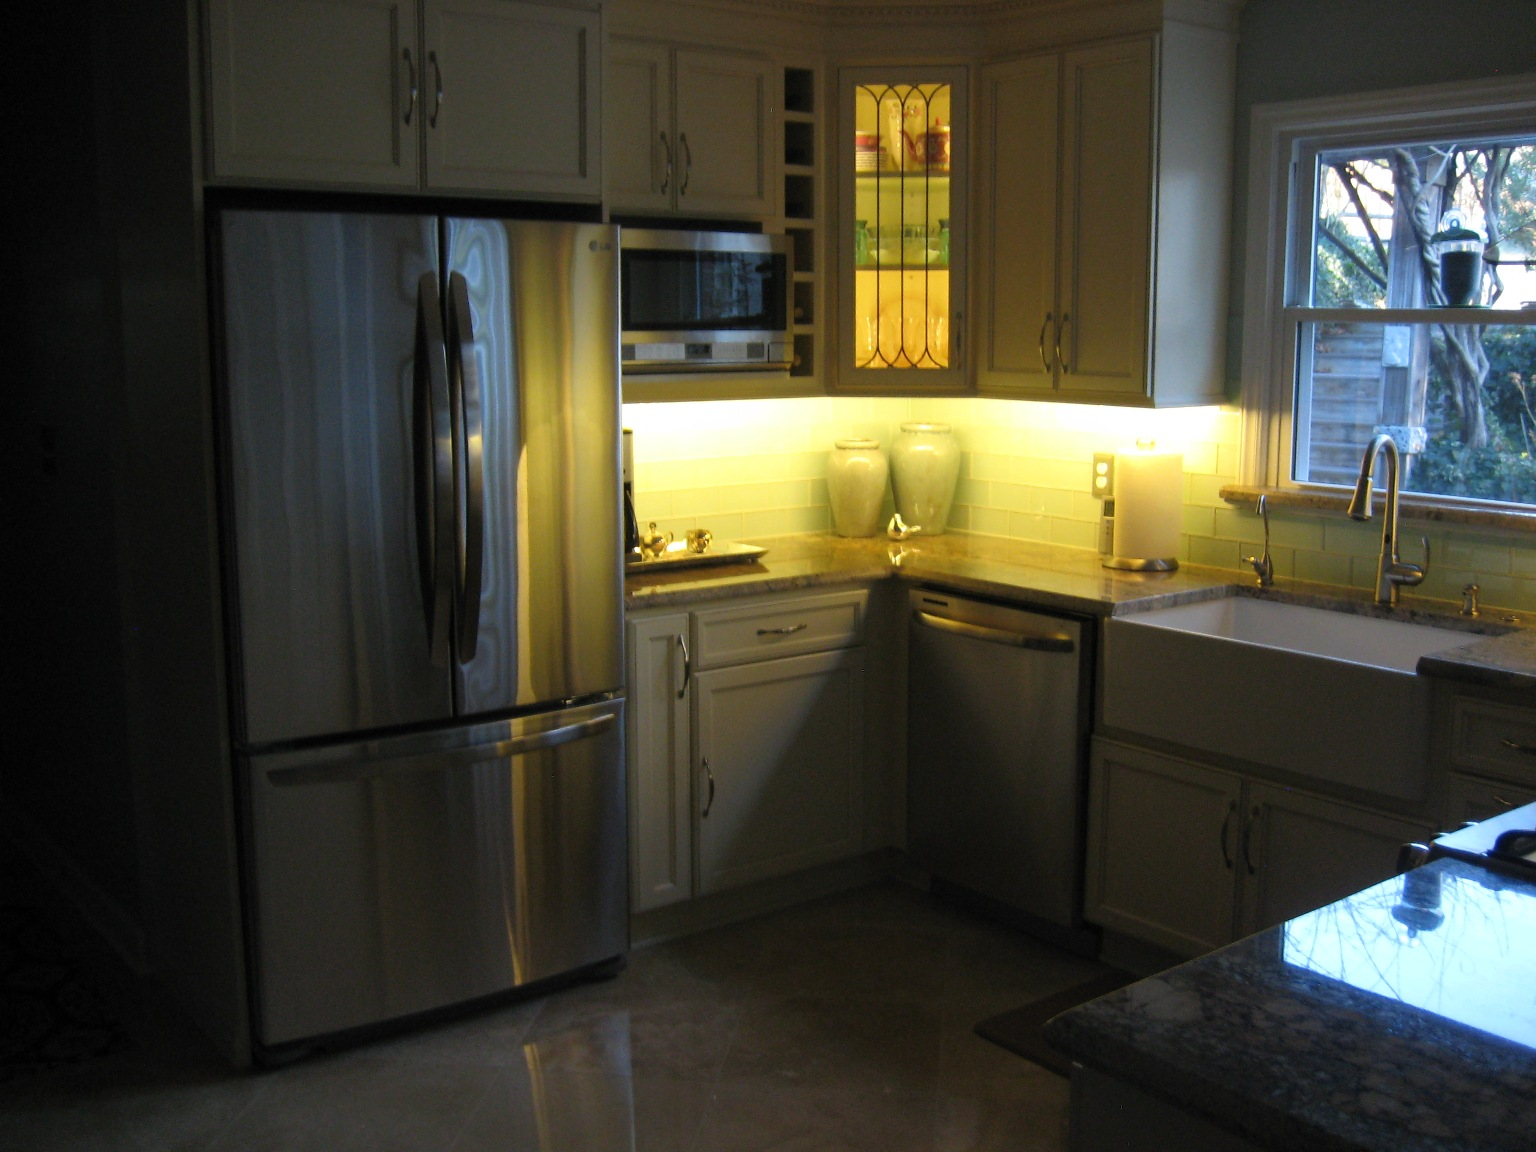 kitchen under cabinet lighting anyone added 2 kitchen under cabinet lighting img Kitchen under cabinet lighting anyone added